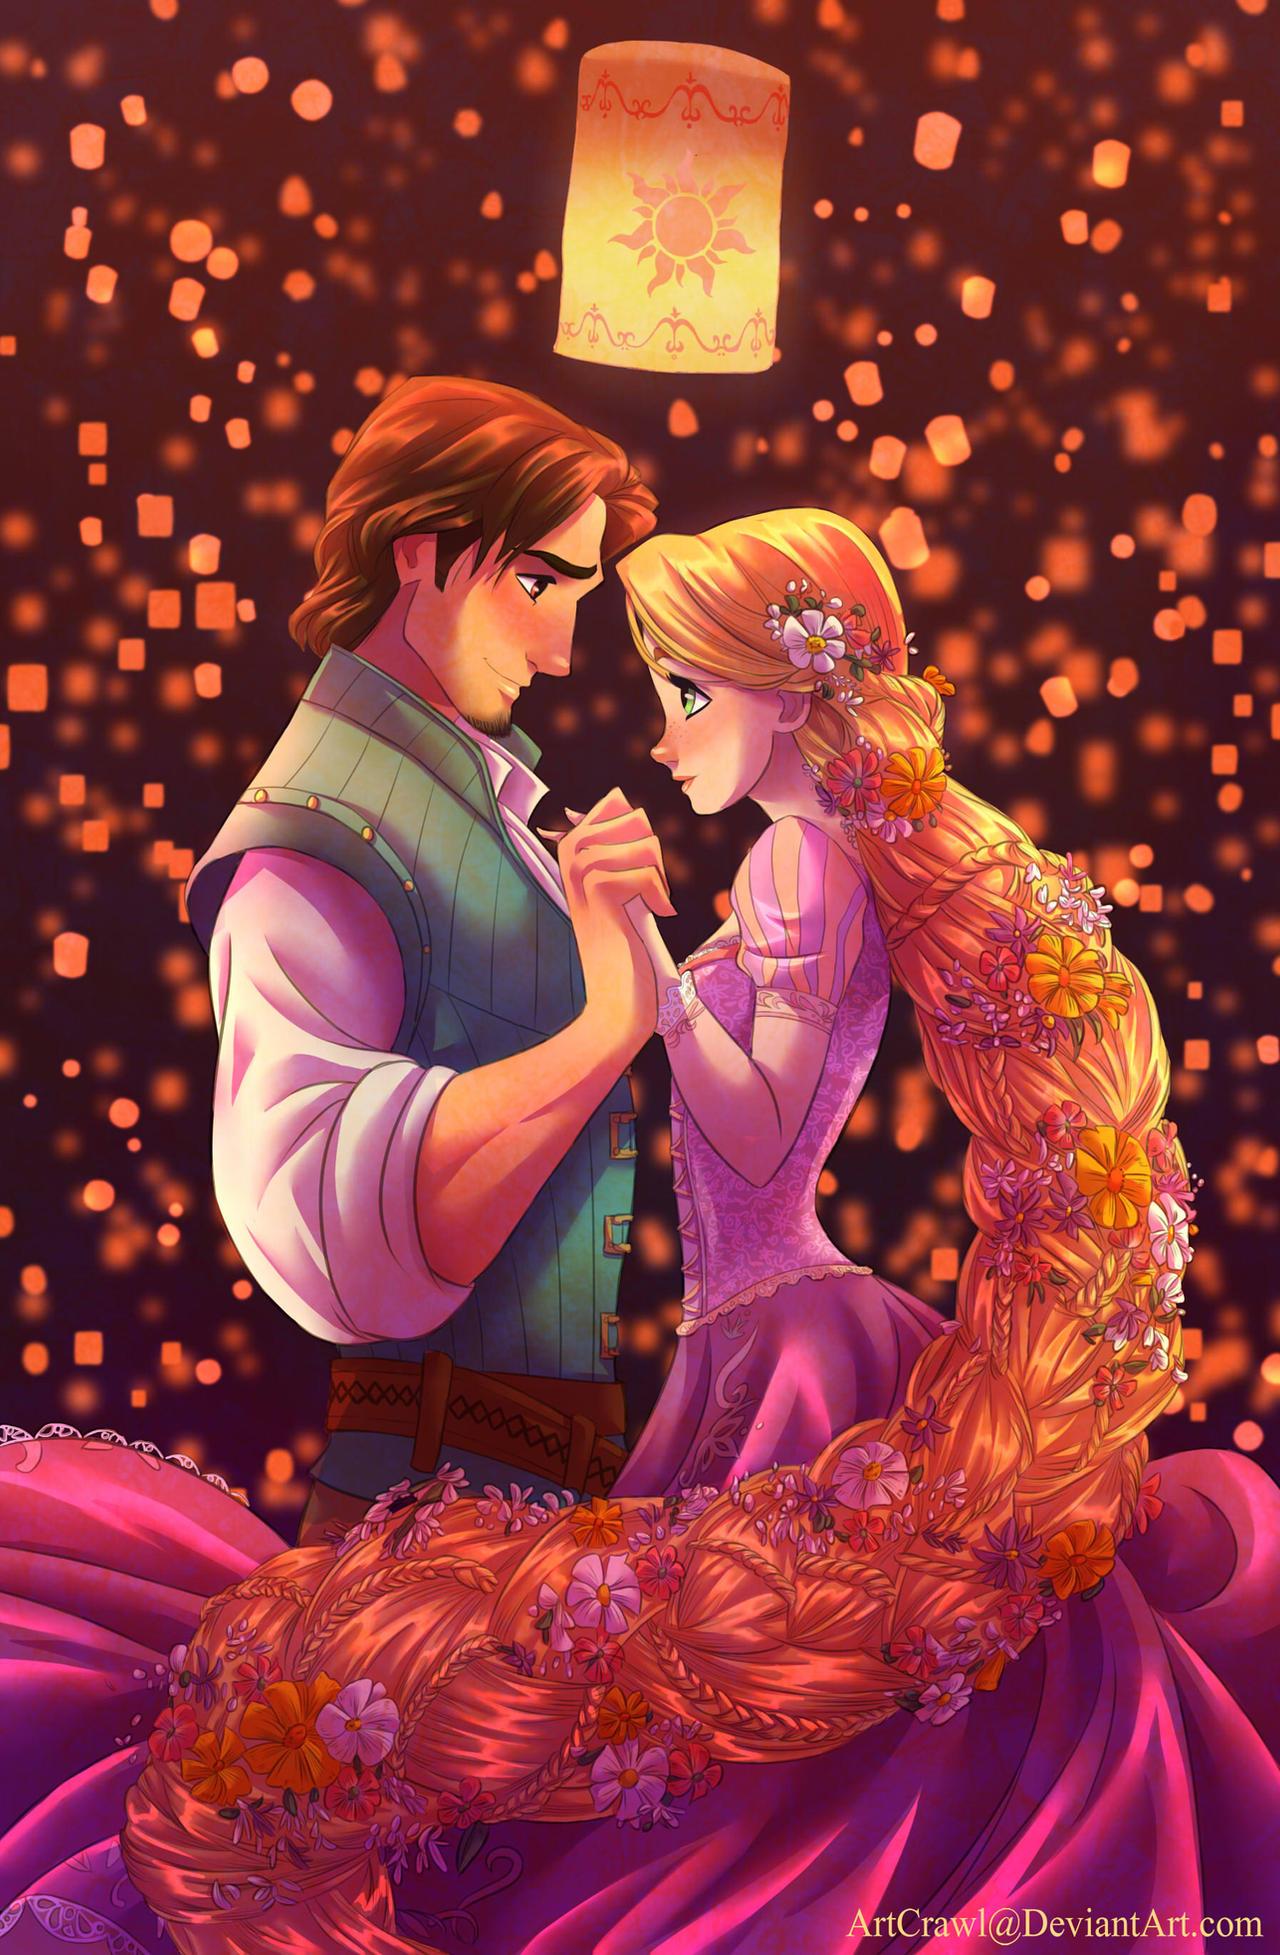 Rapunzel And Flynn By Artcrawl On Deviantart